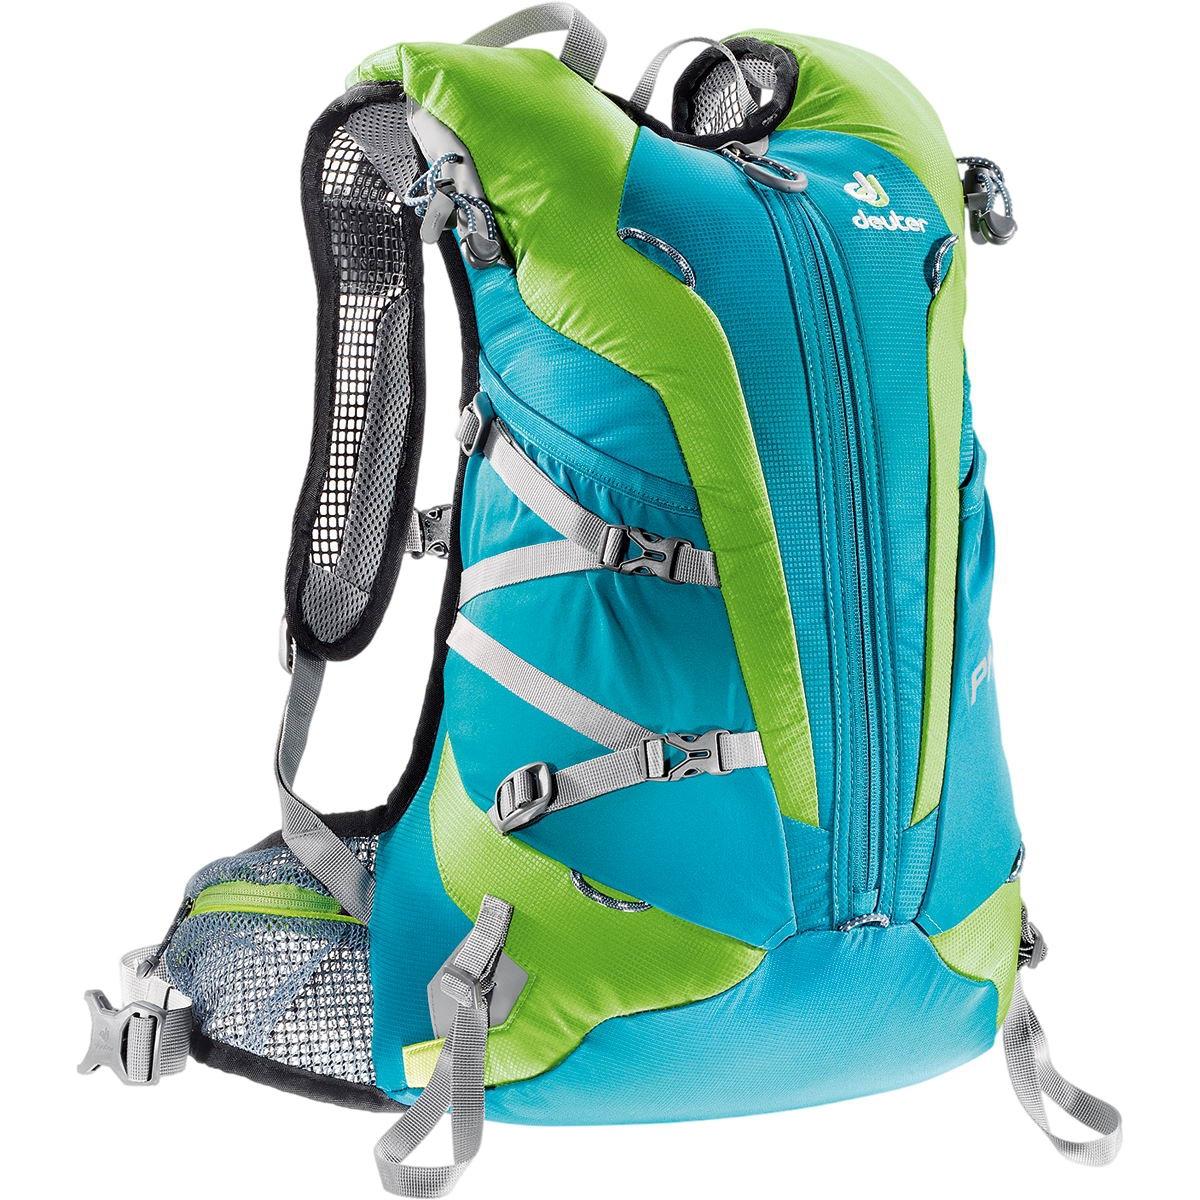 Рюкзаки для скитура Рюкзак Deuter Pace 20 deuter-pace-20-ski-tourenrucksack-petrol-kiwi-de.3300015.3214_z1.jpg